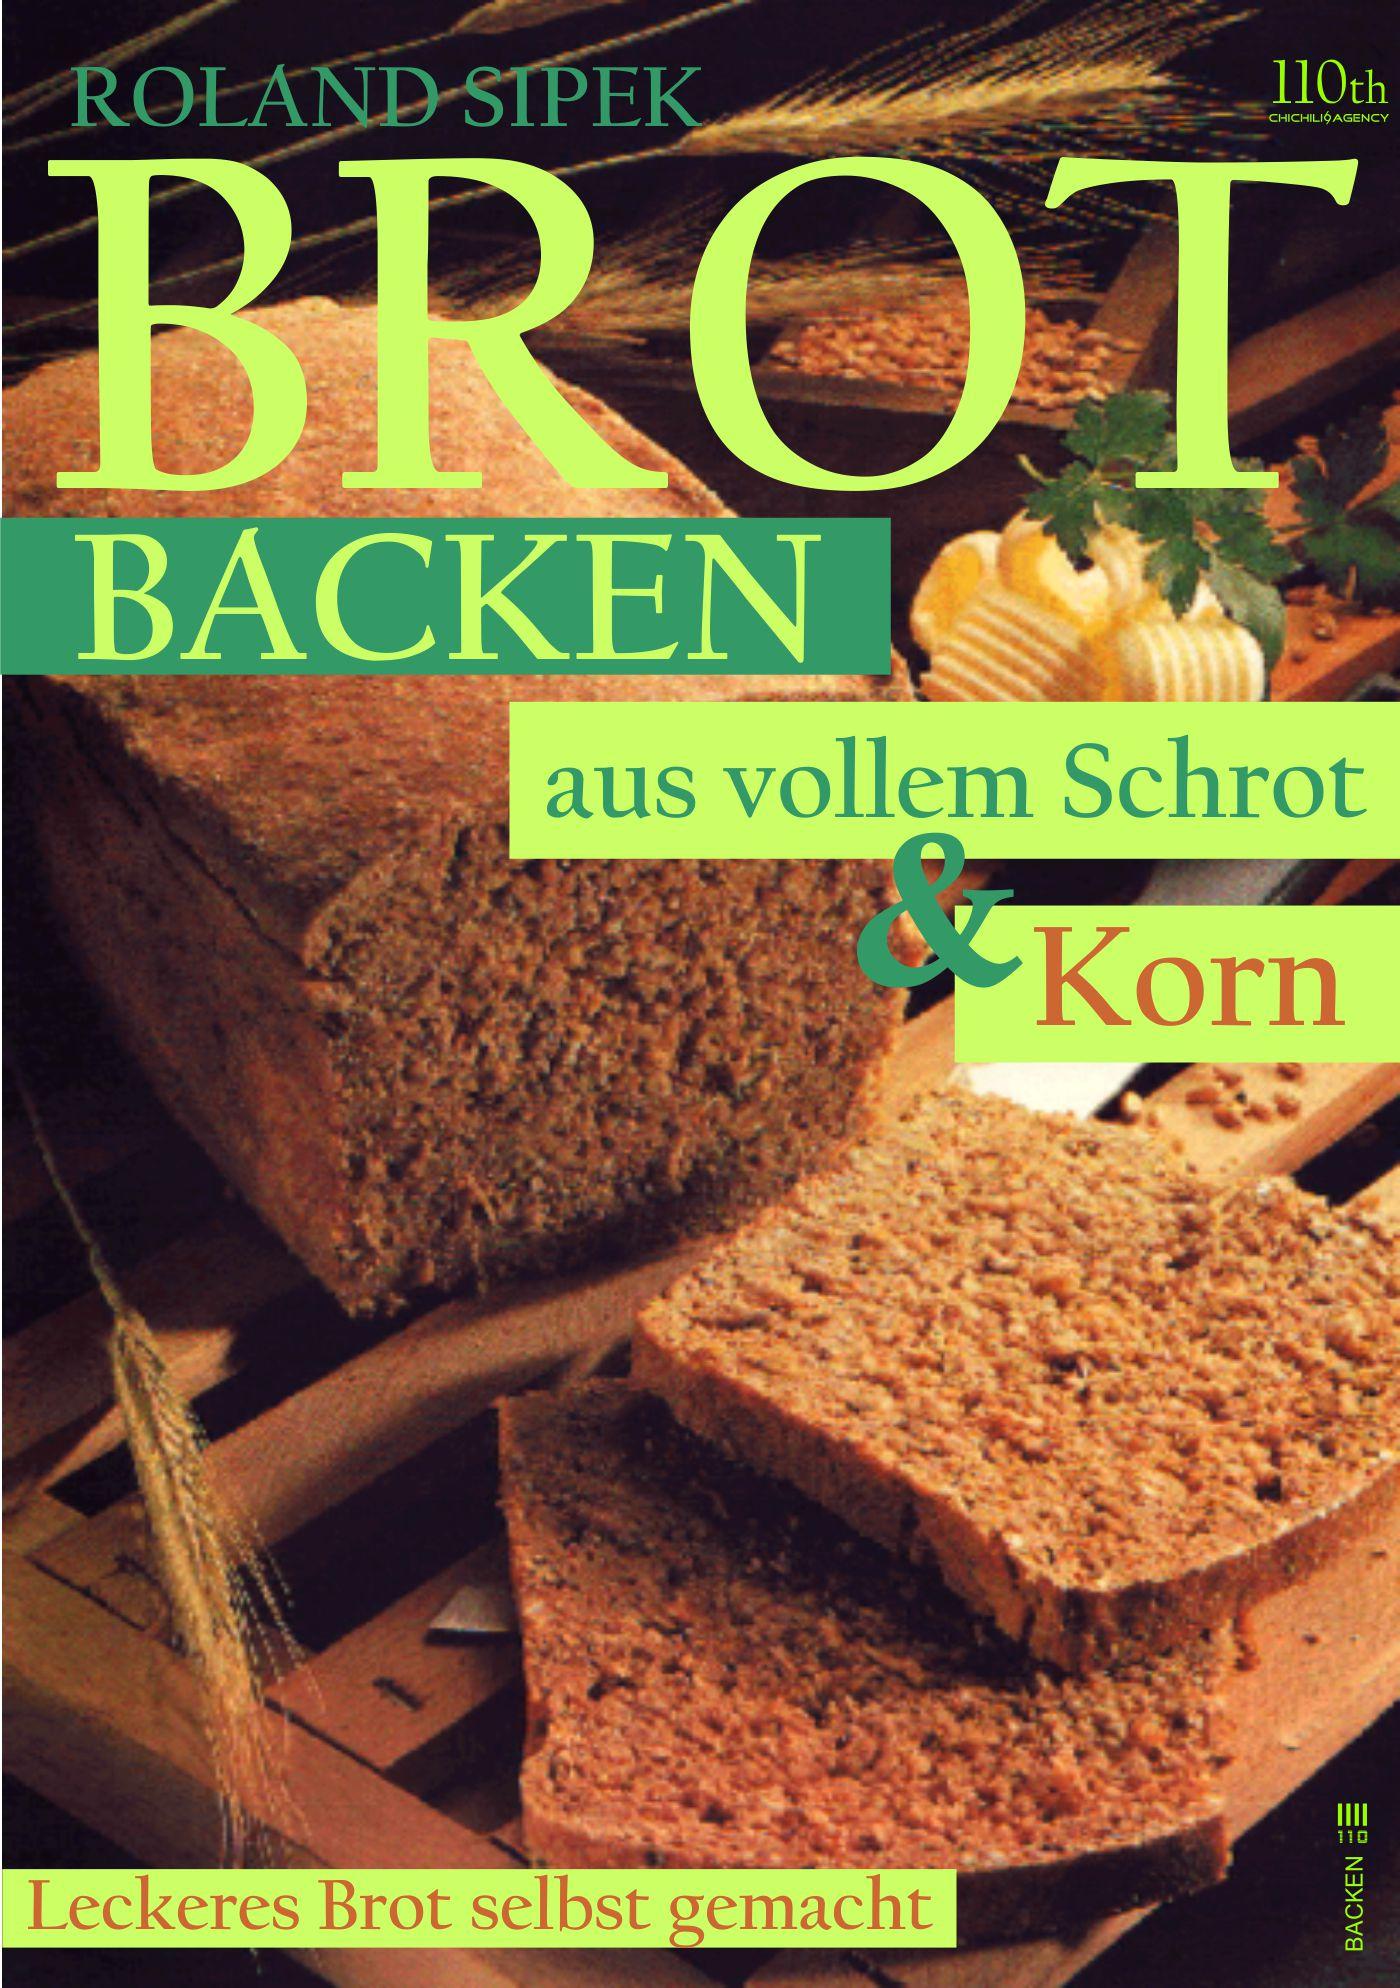 цена Roland Sipek Brotbacken aus vollem Schrot und Korn онлайн в 2017 году